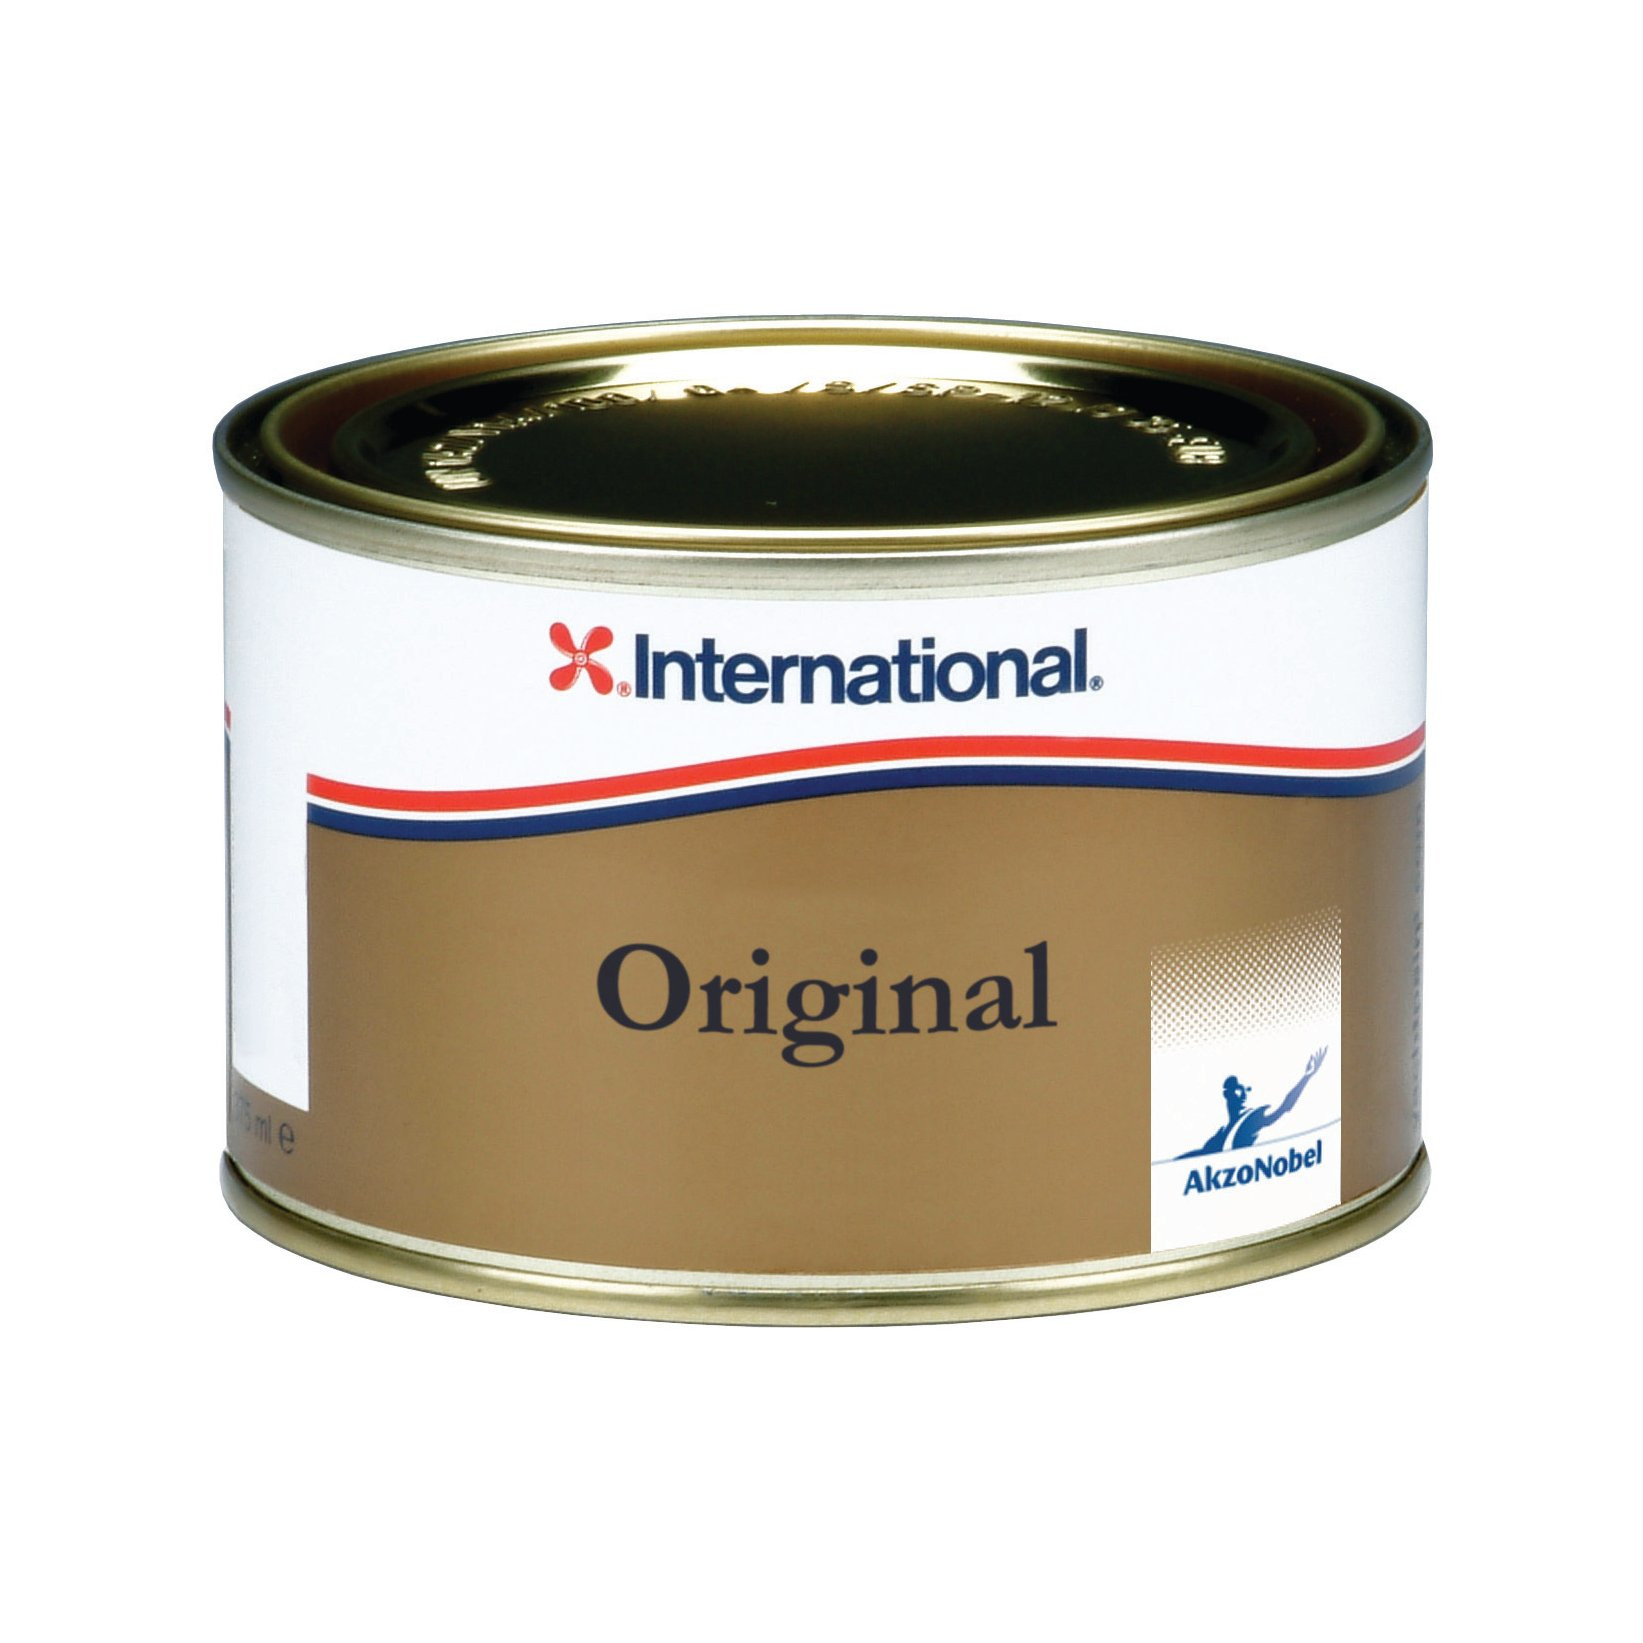 International Original hoogglanzende vernis - 375ml